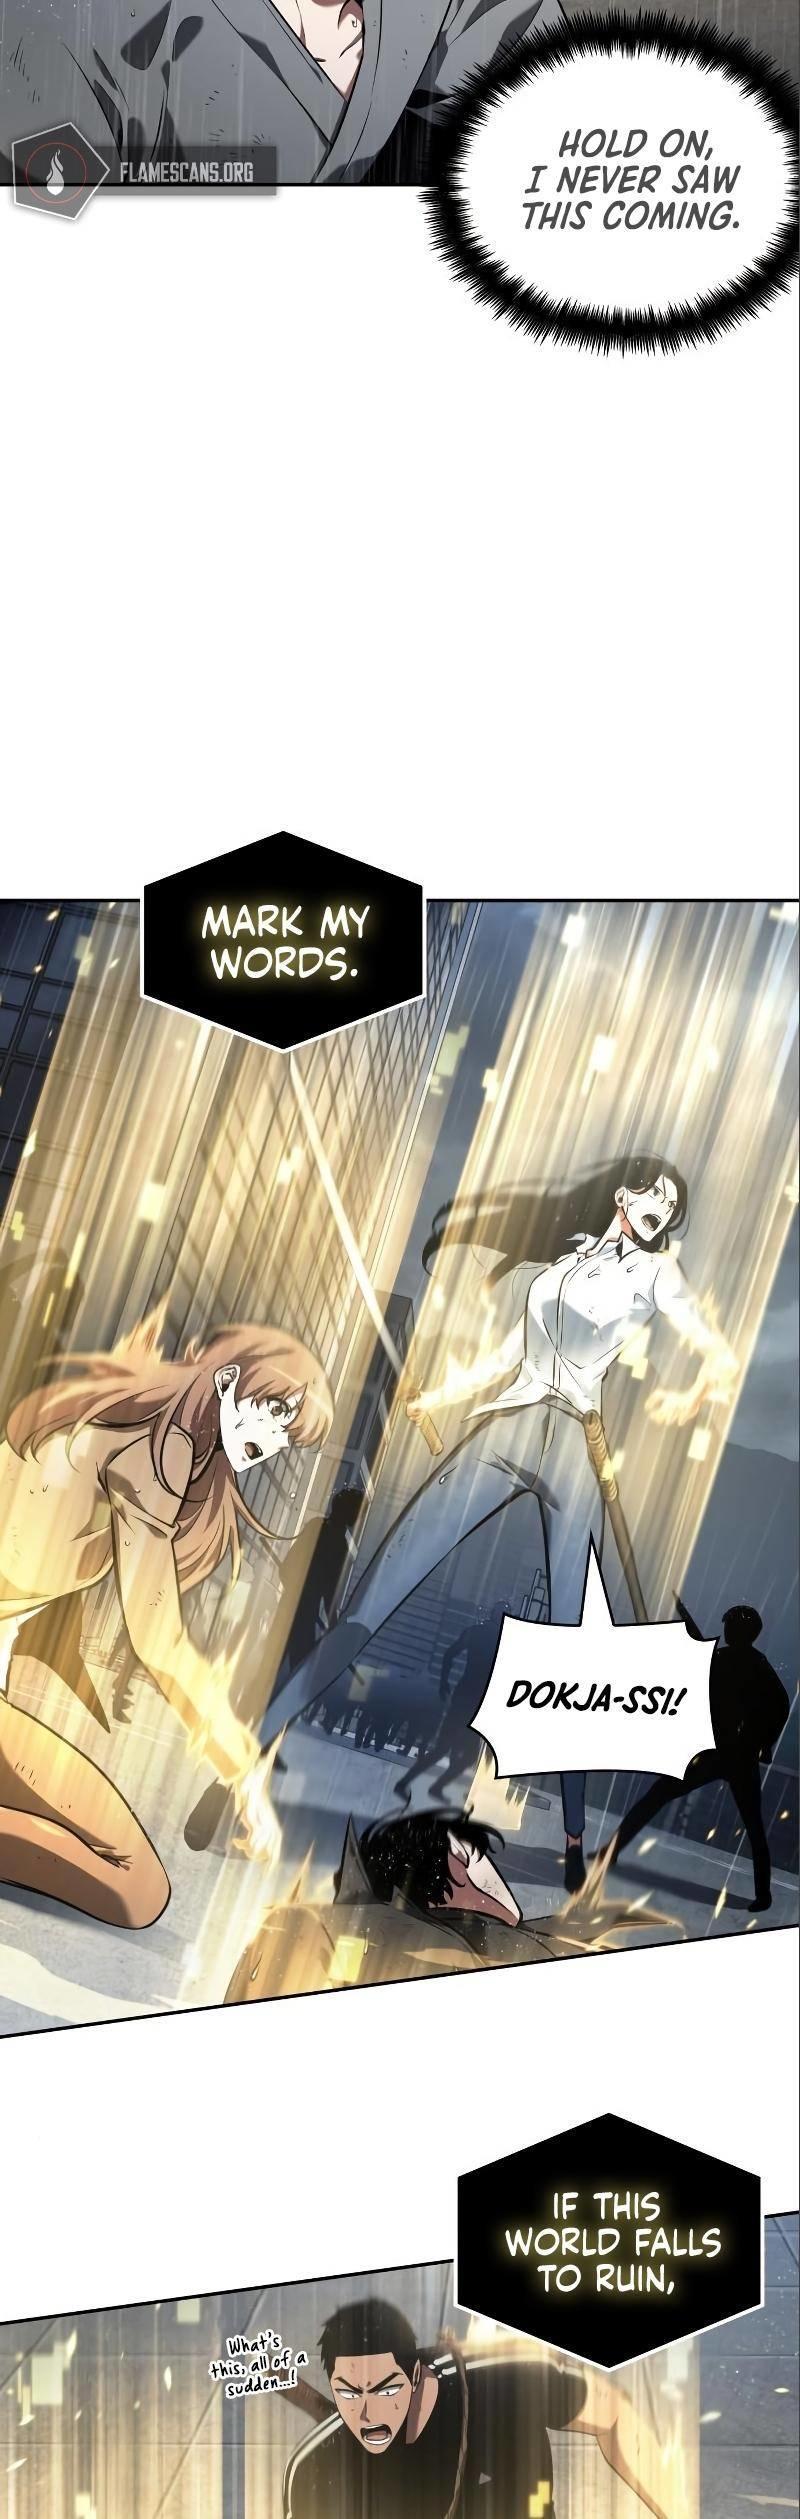 Omniscient Reader'S Viewpoint Chapter 67 page 8 - Mangakakalots.com